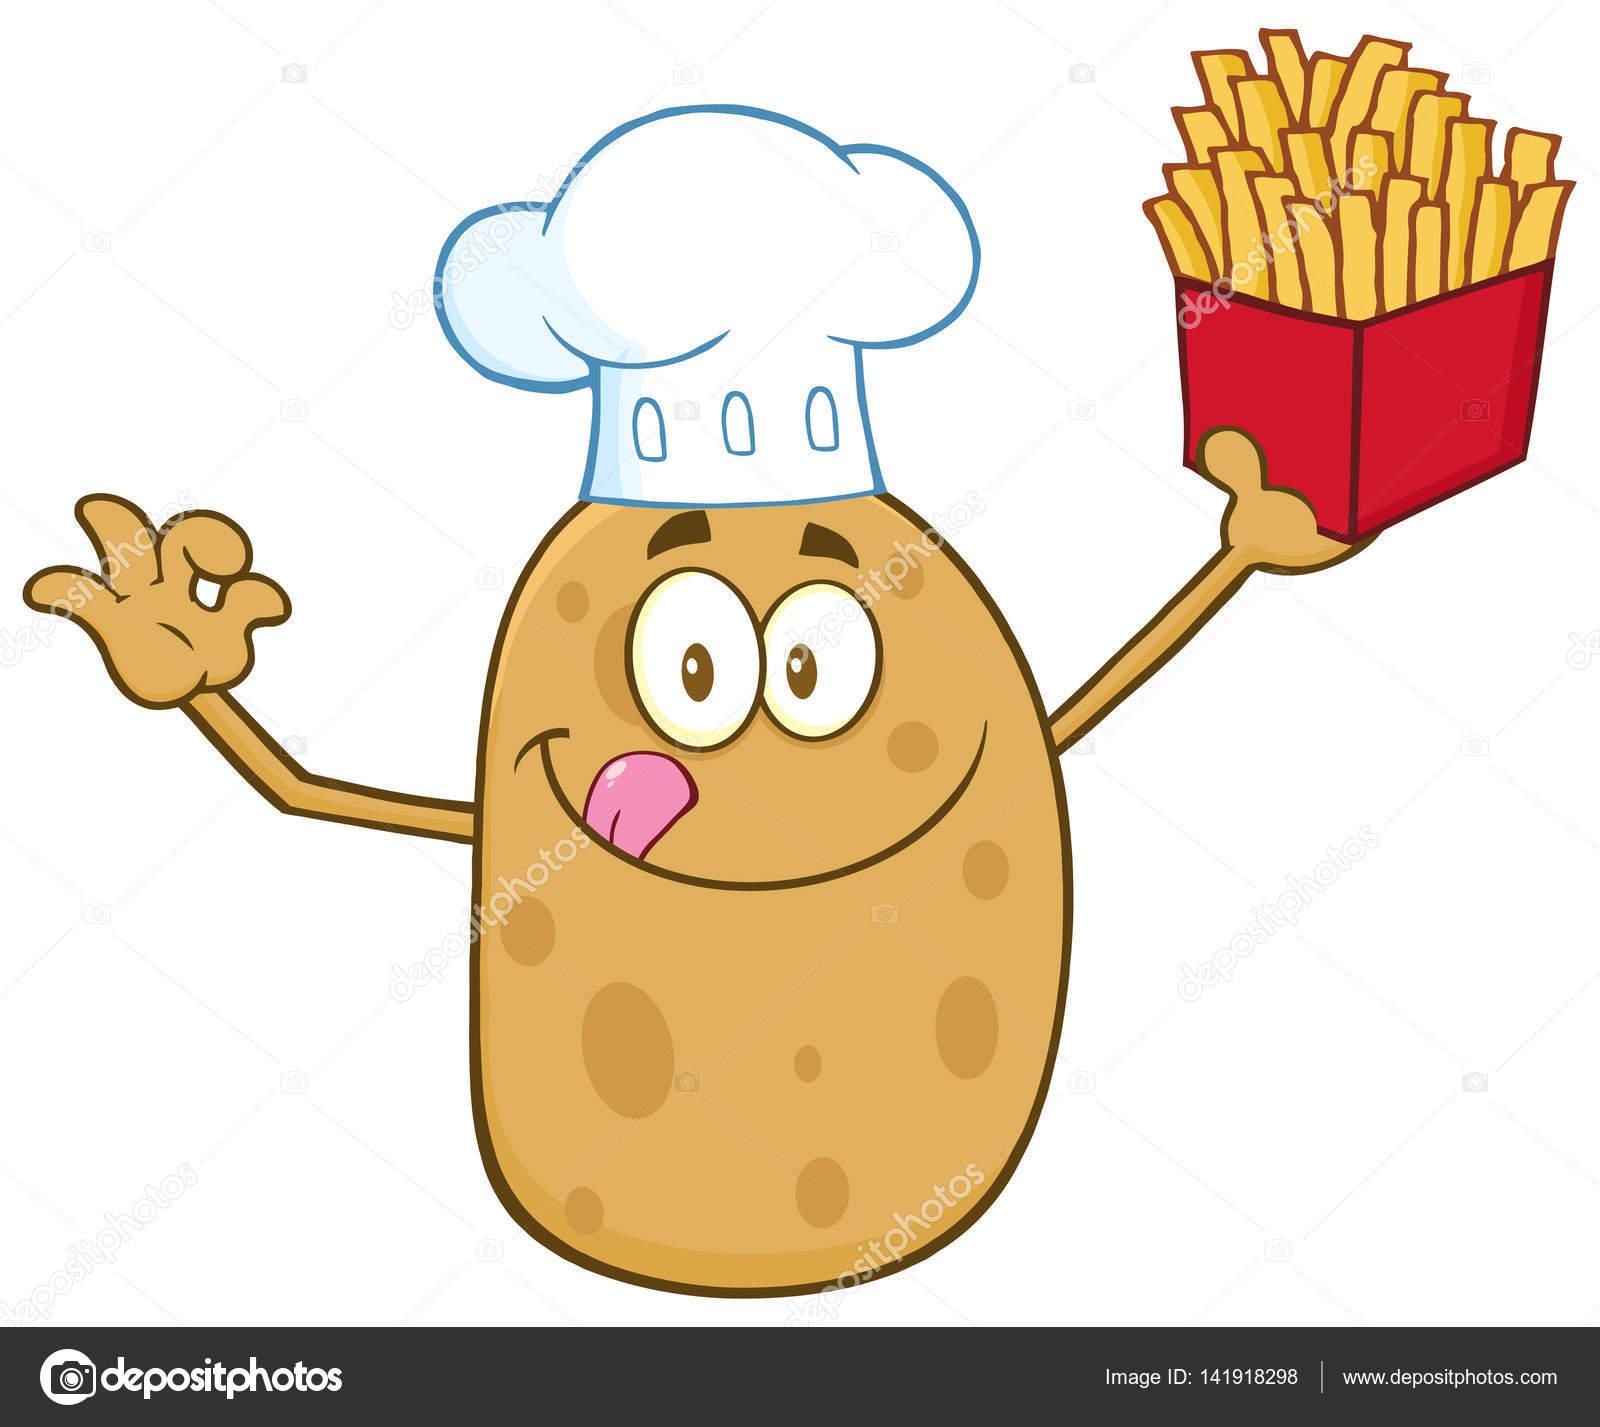 potato cartoon picture cartoon ankaperla com chef clip art free printable images chef clip art free download